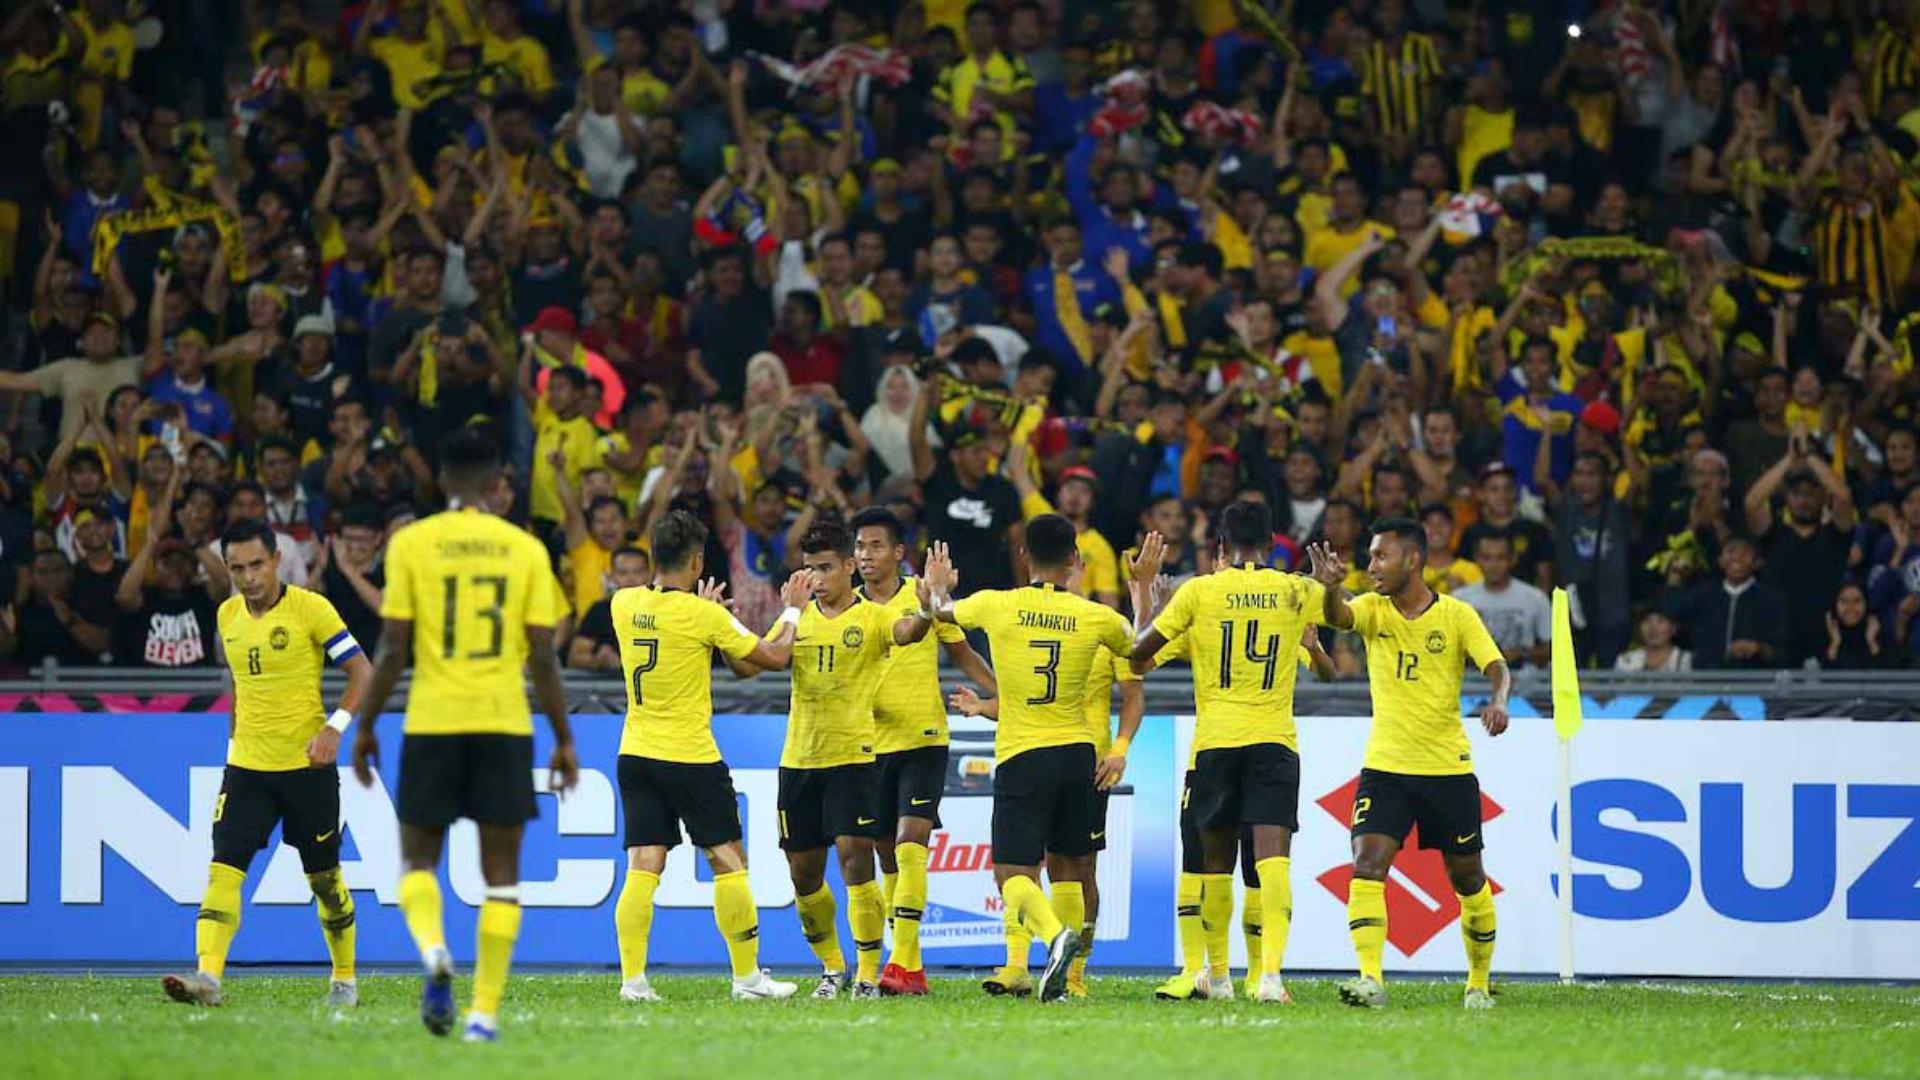 malaysia-2018-aff-suzuki-cup_7gfdkiqvnwyr1av9de6ttap1h